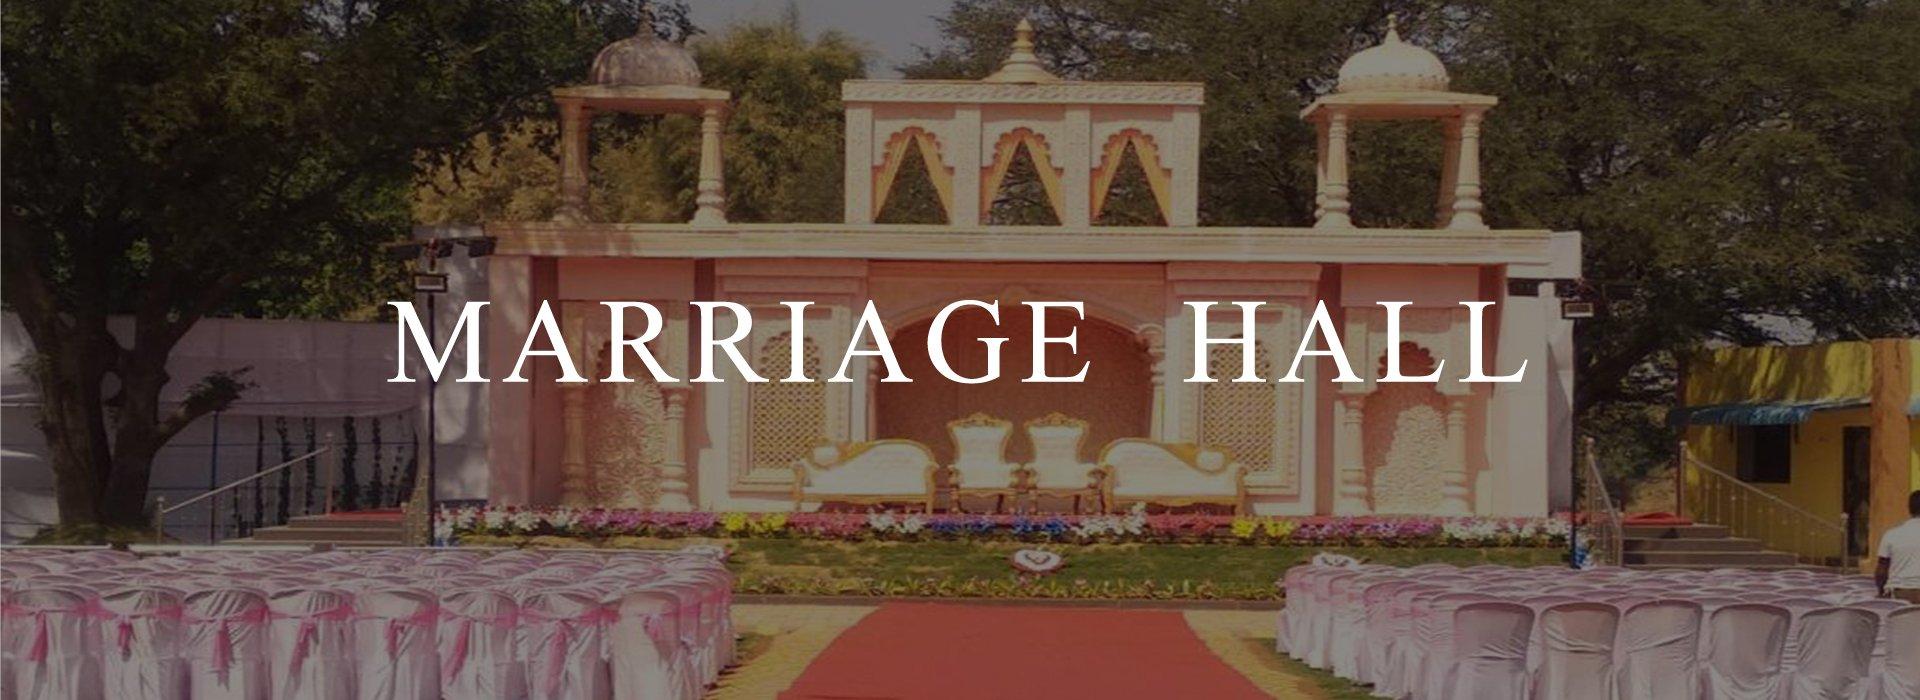 Marriage Hall Header Image